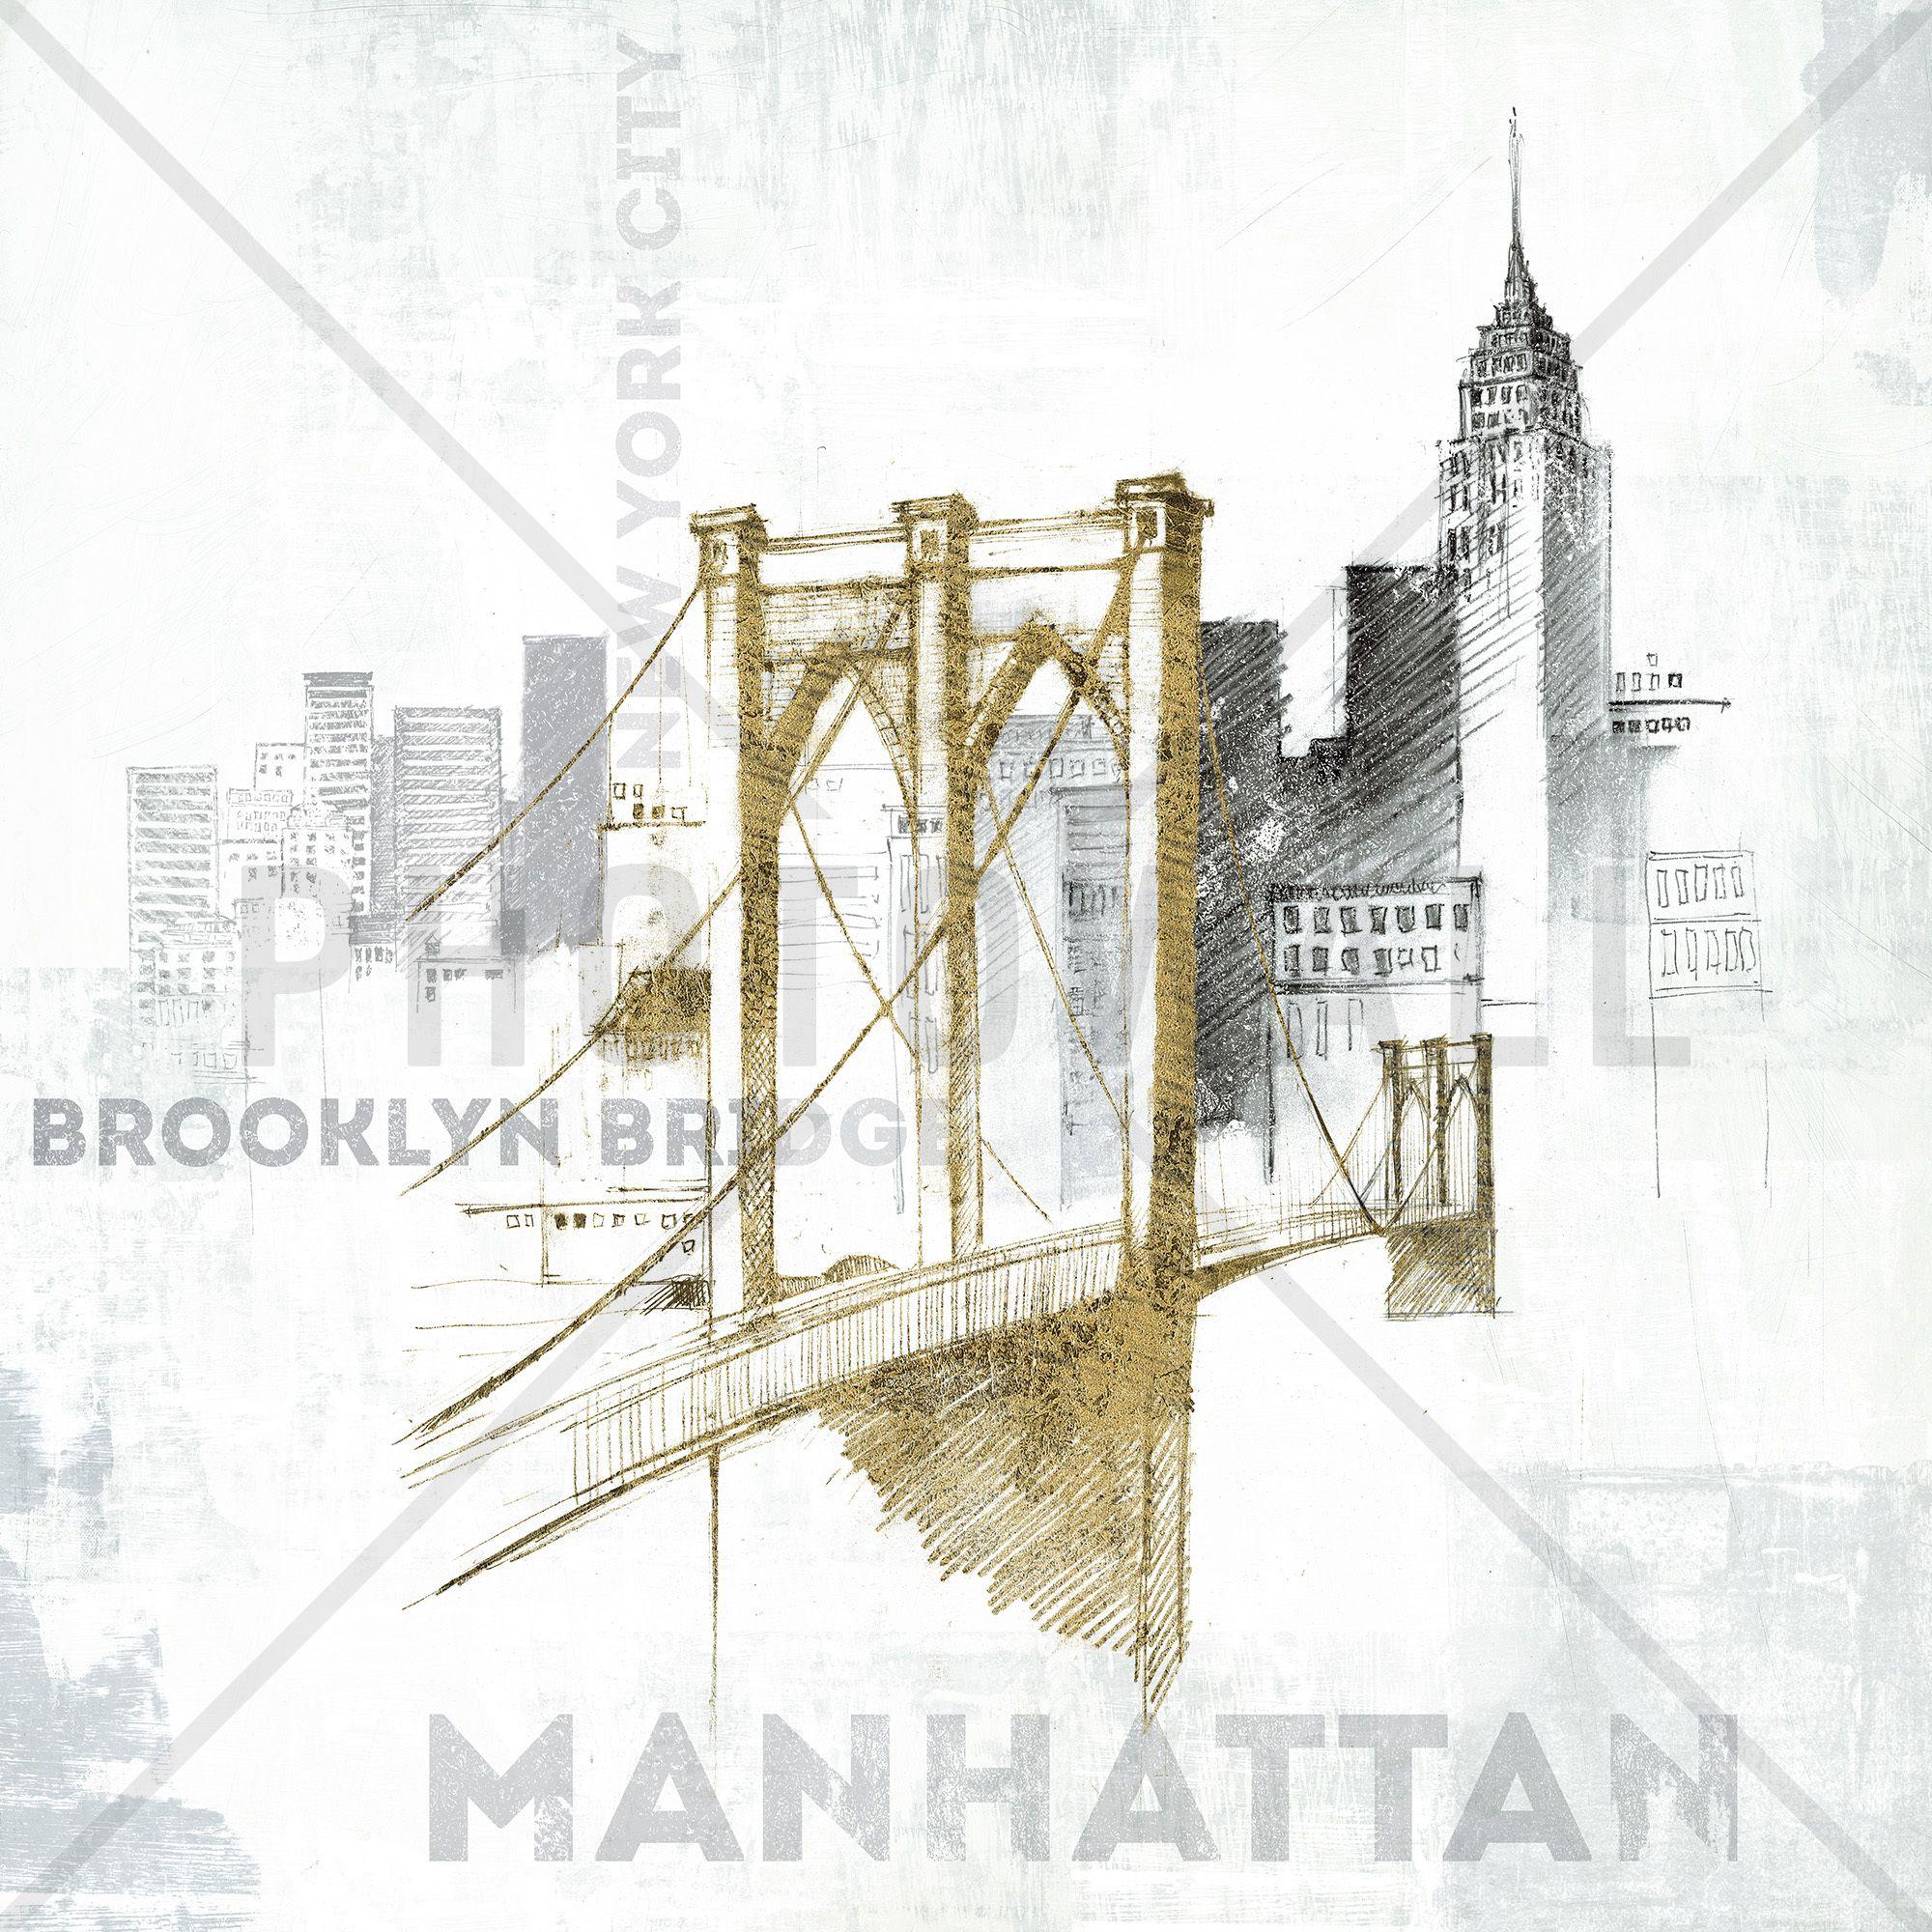 Brooklyn Bridge Wall Mural & Photo Wallpaper Photowall